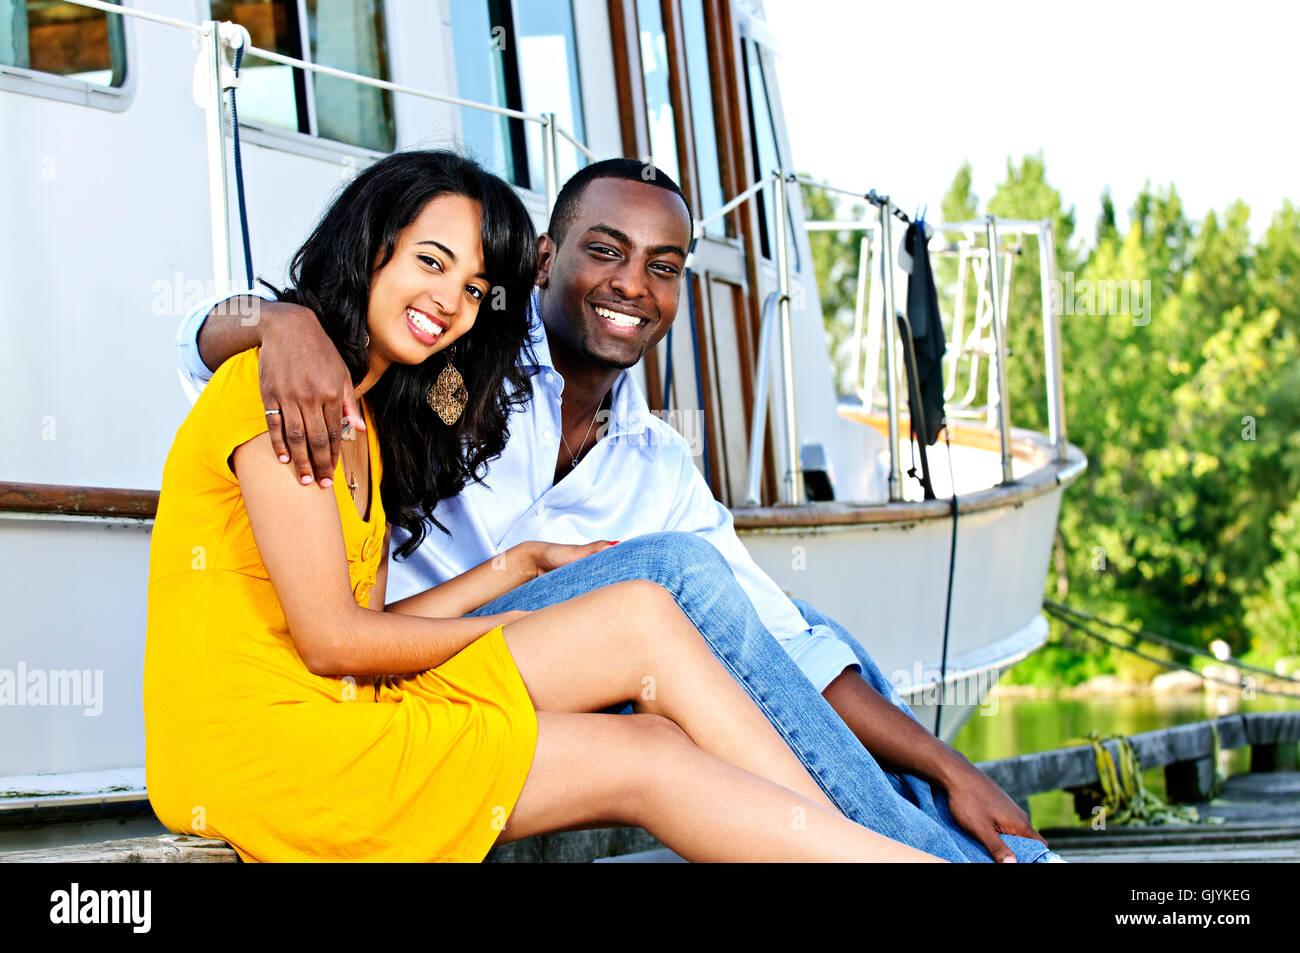 romantic yacht boat - Stock Image